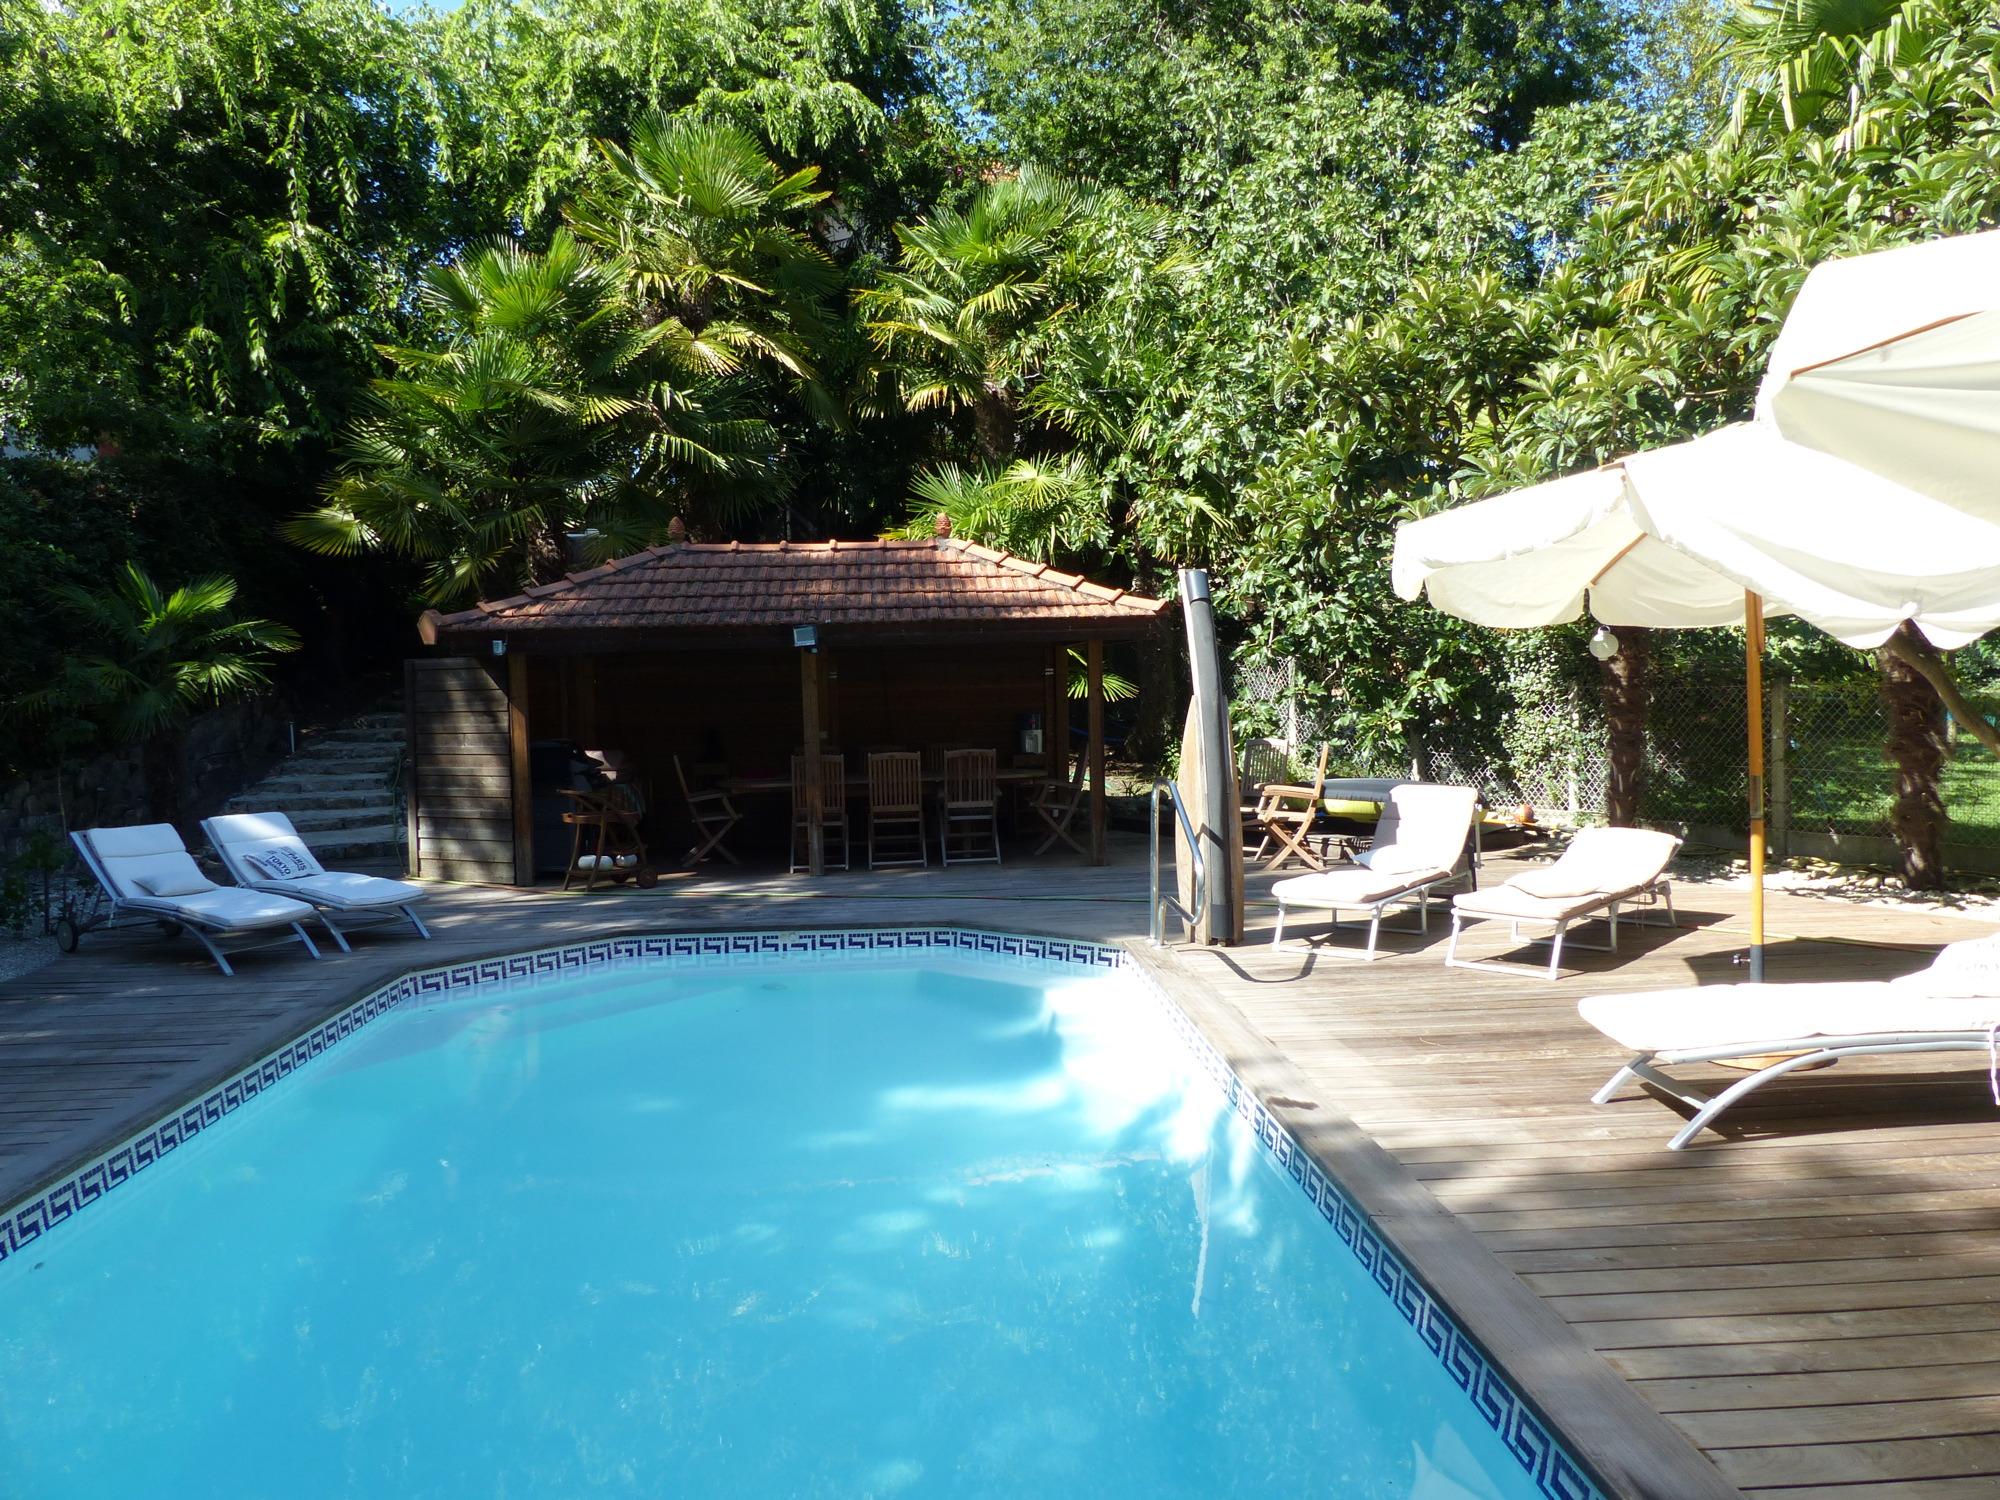 Vente arcachon belle demeure avec piscine barnes bassin - Camping bassin d arcachon avec piscine ...